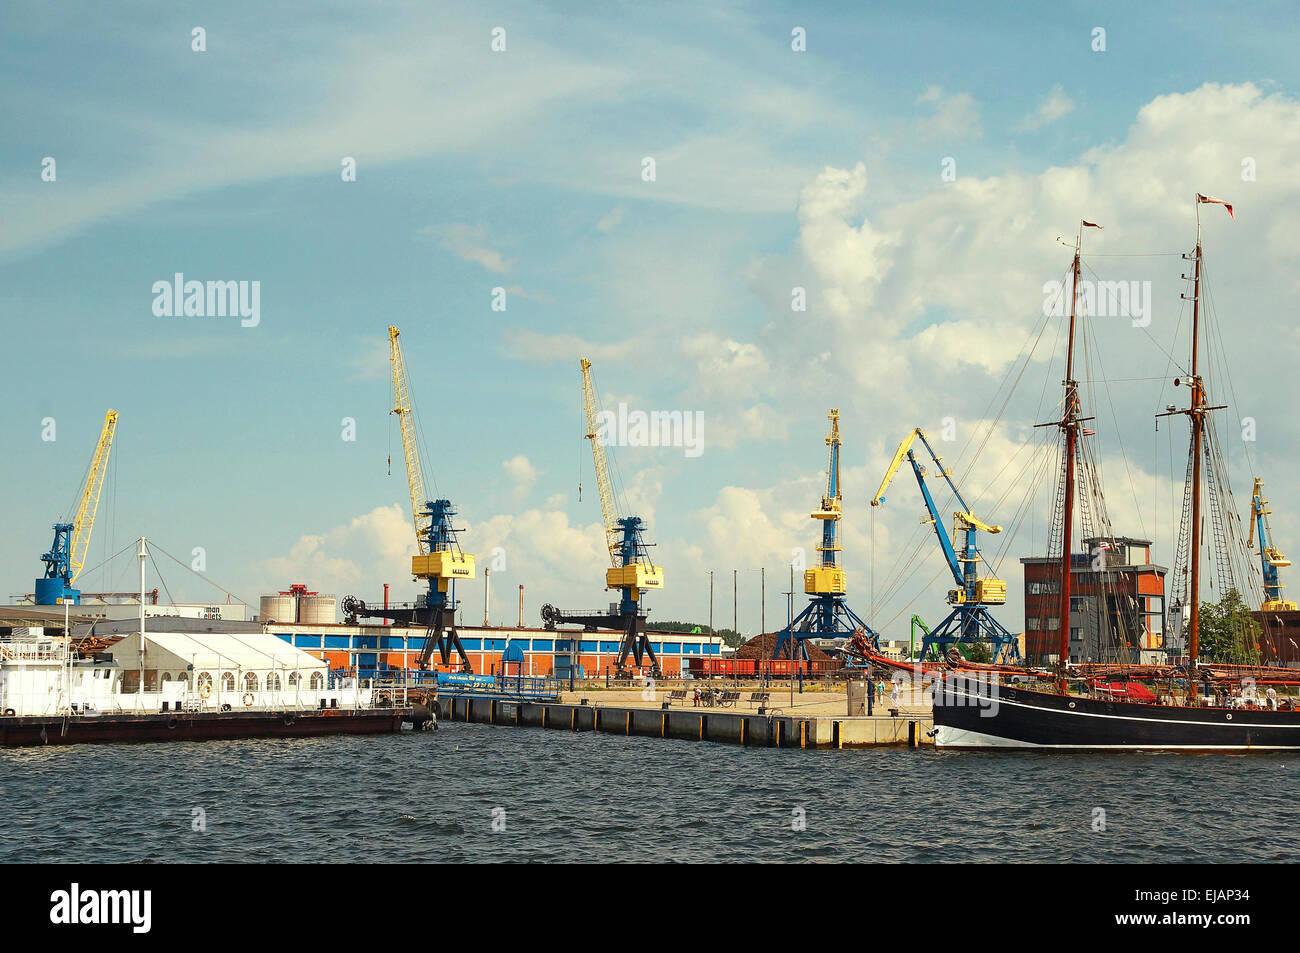 Port Hanseatic City Wismar Germany - Stock Image